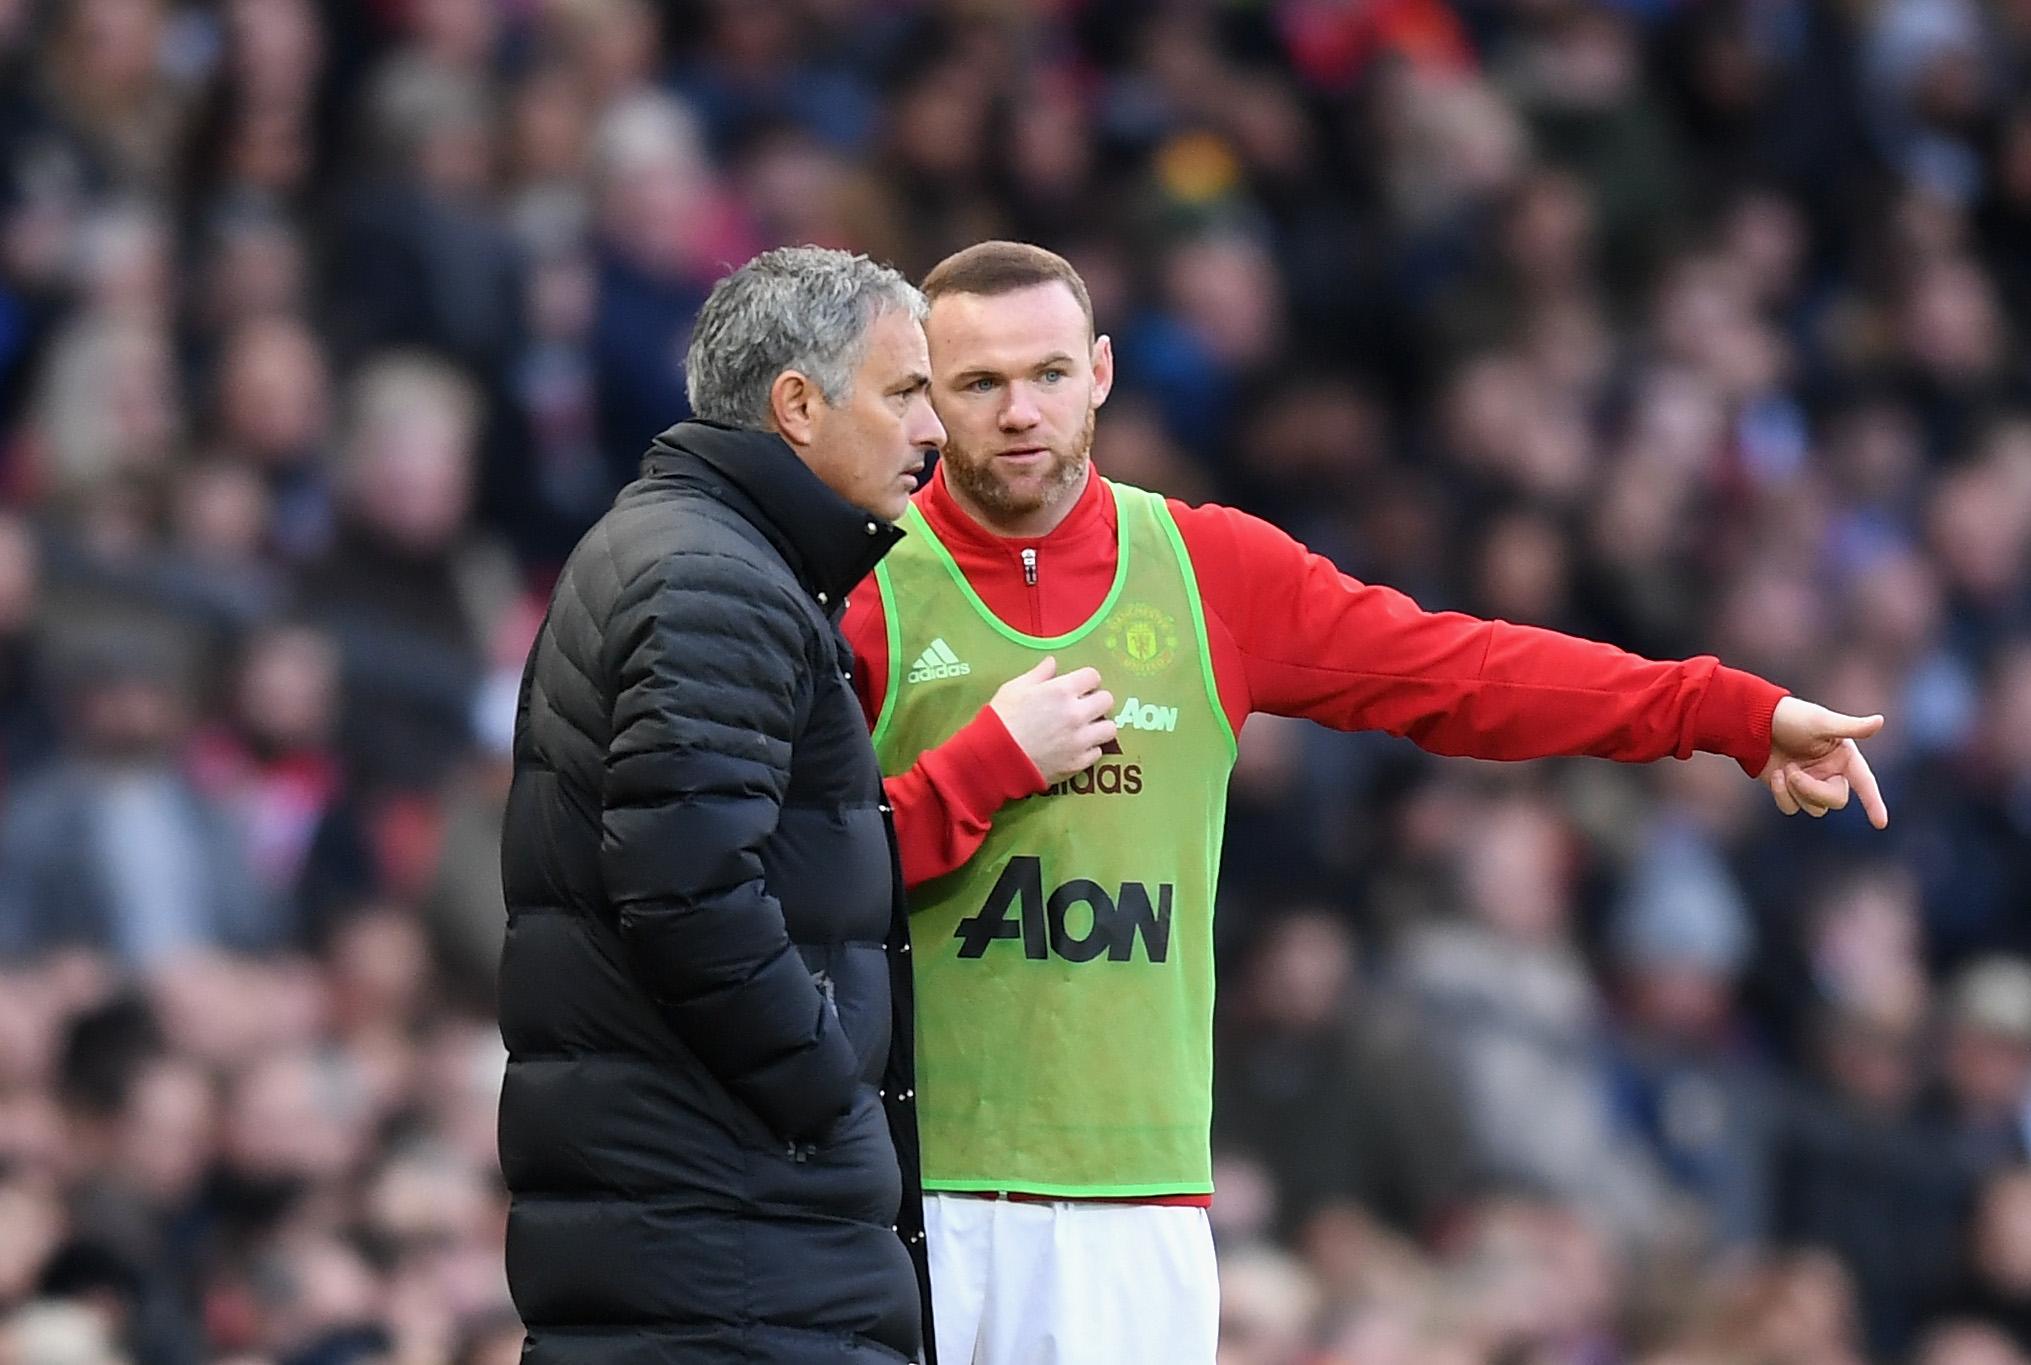 Manchester United staff 'weren't enjoying going into work' under Jose Mourinho, says Wayne Rooney